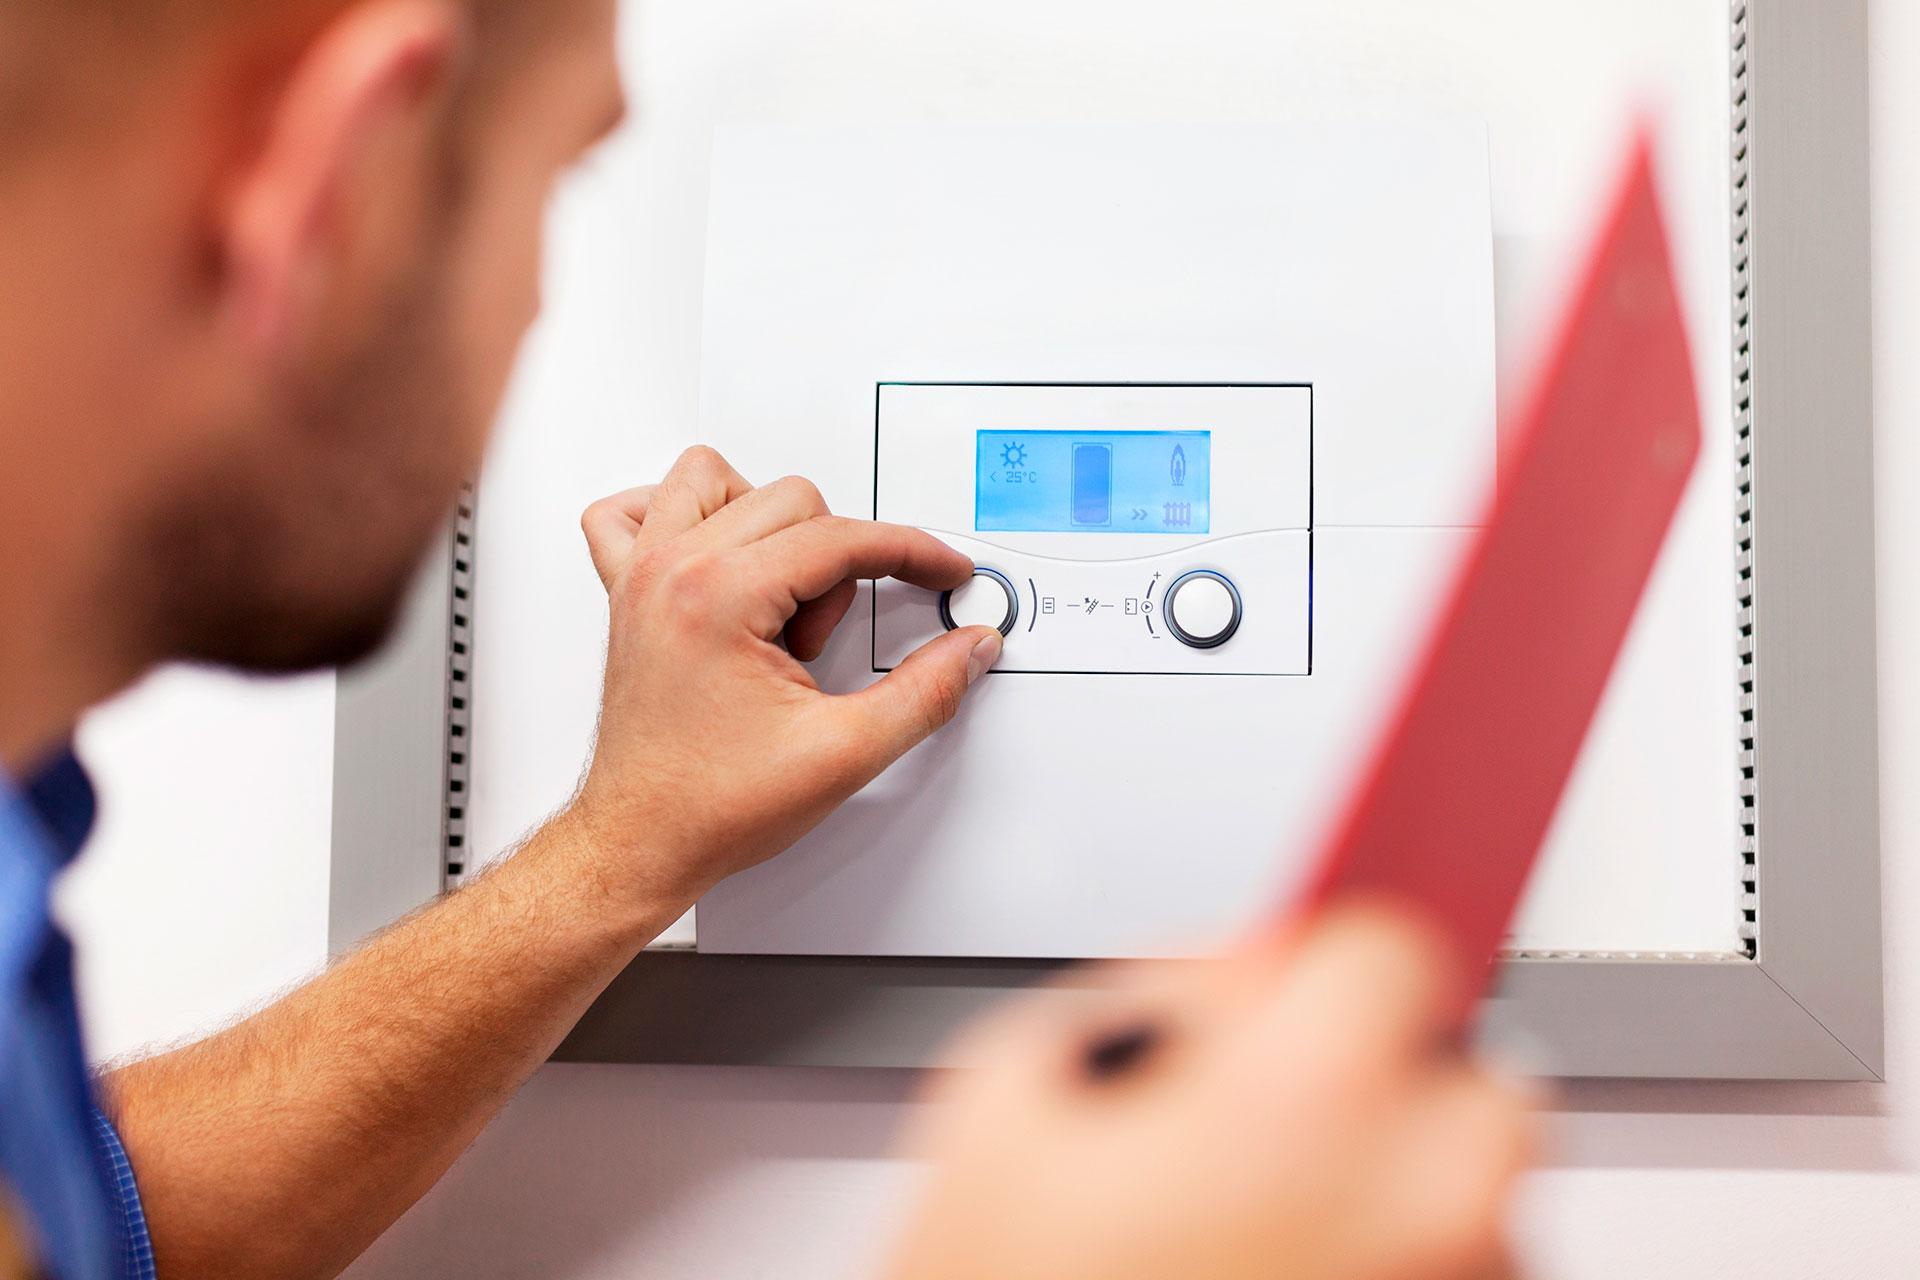 affitto manutenzione caldaia